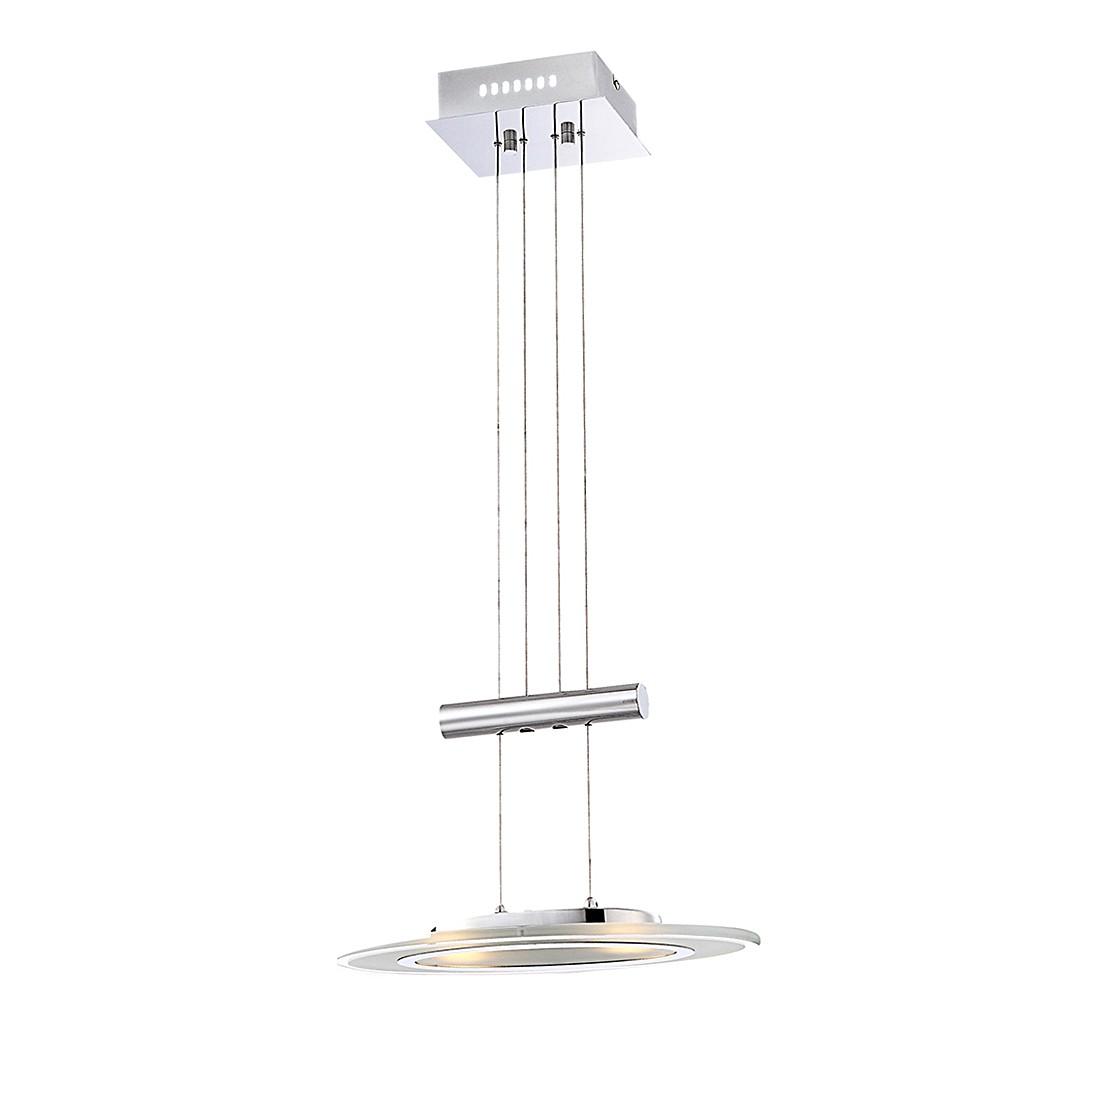 Hängeleuchte NESTOR I – Metall – Silber – 2-flammig, Globo Lighting online kaufen